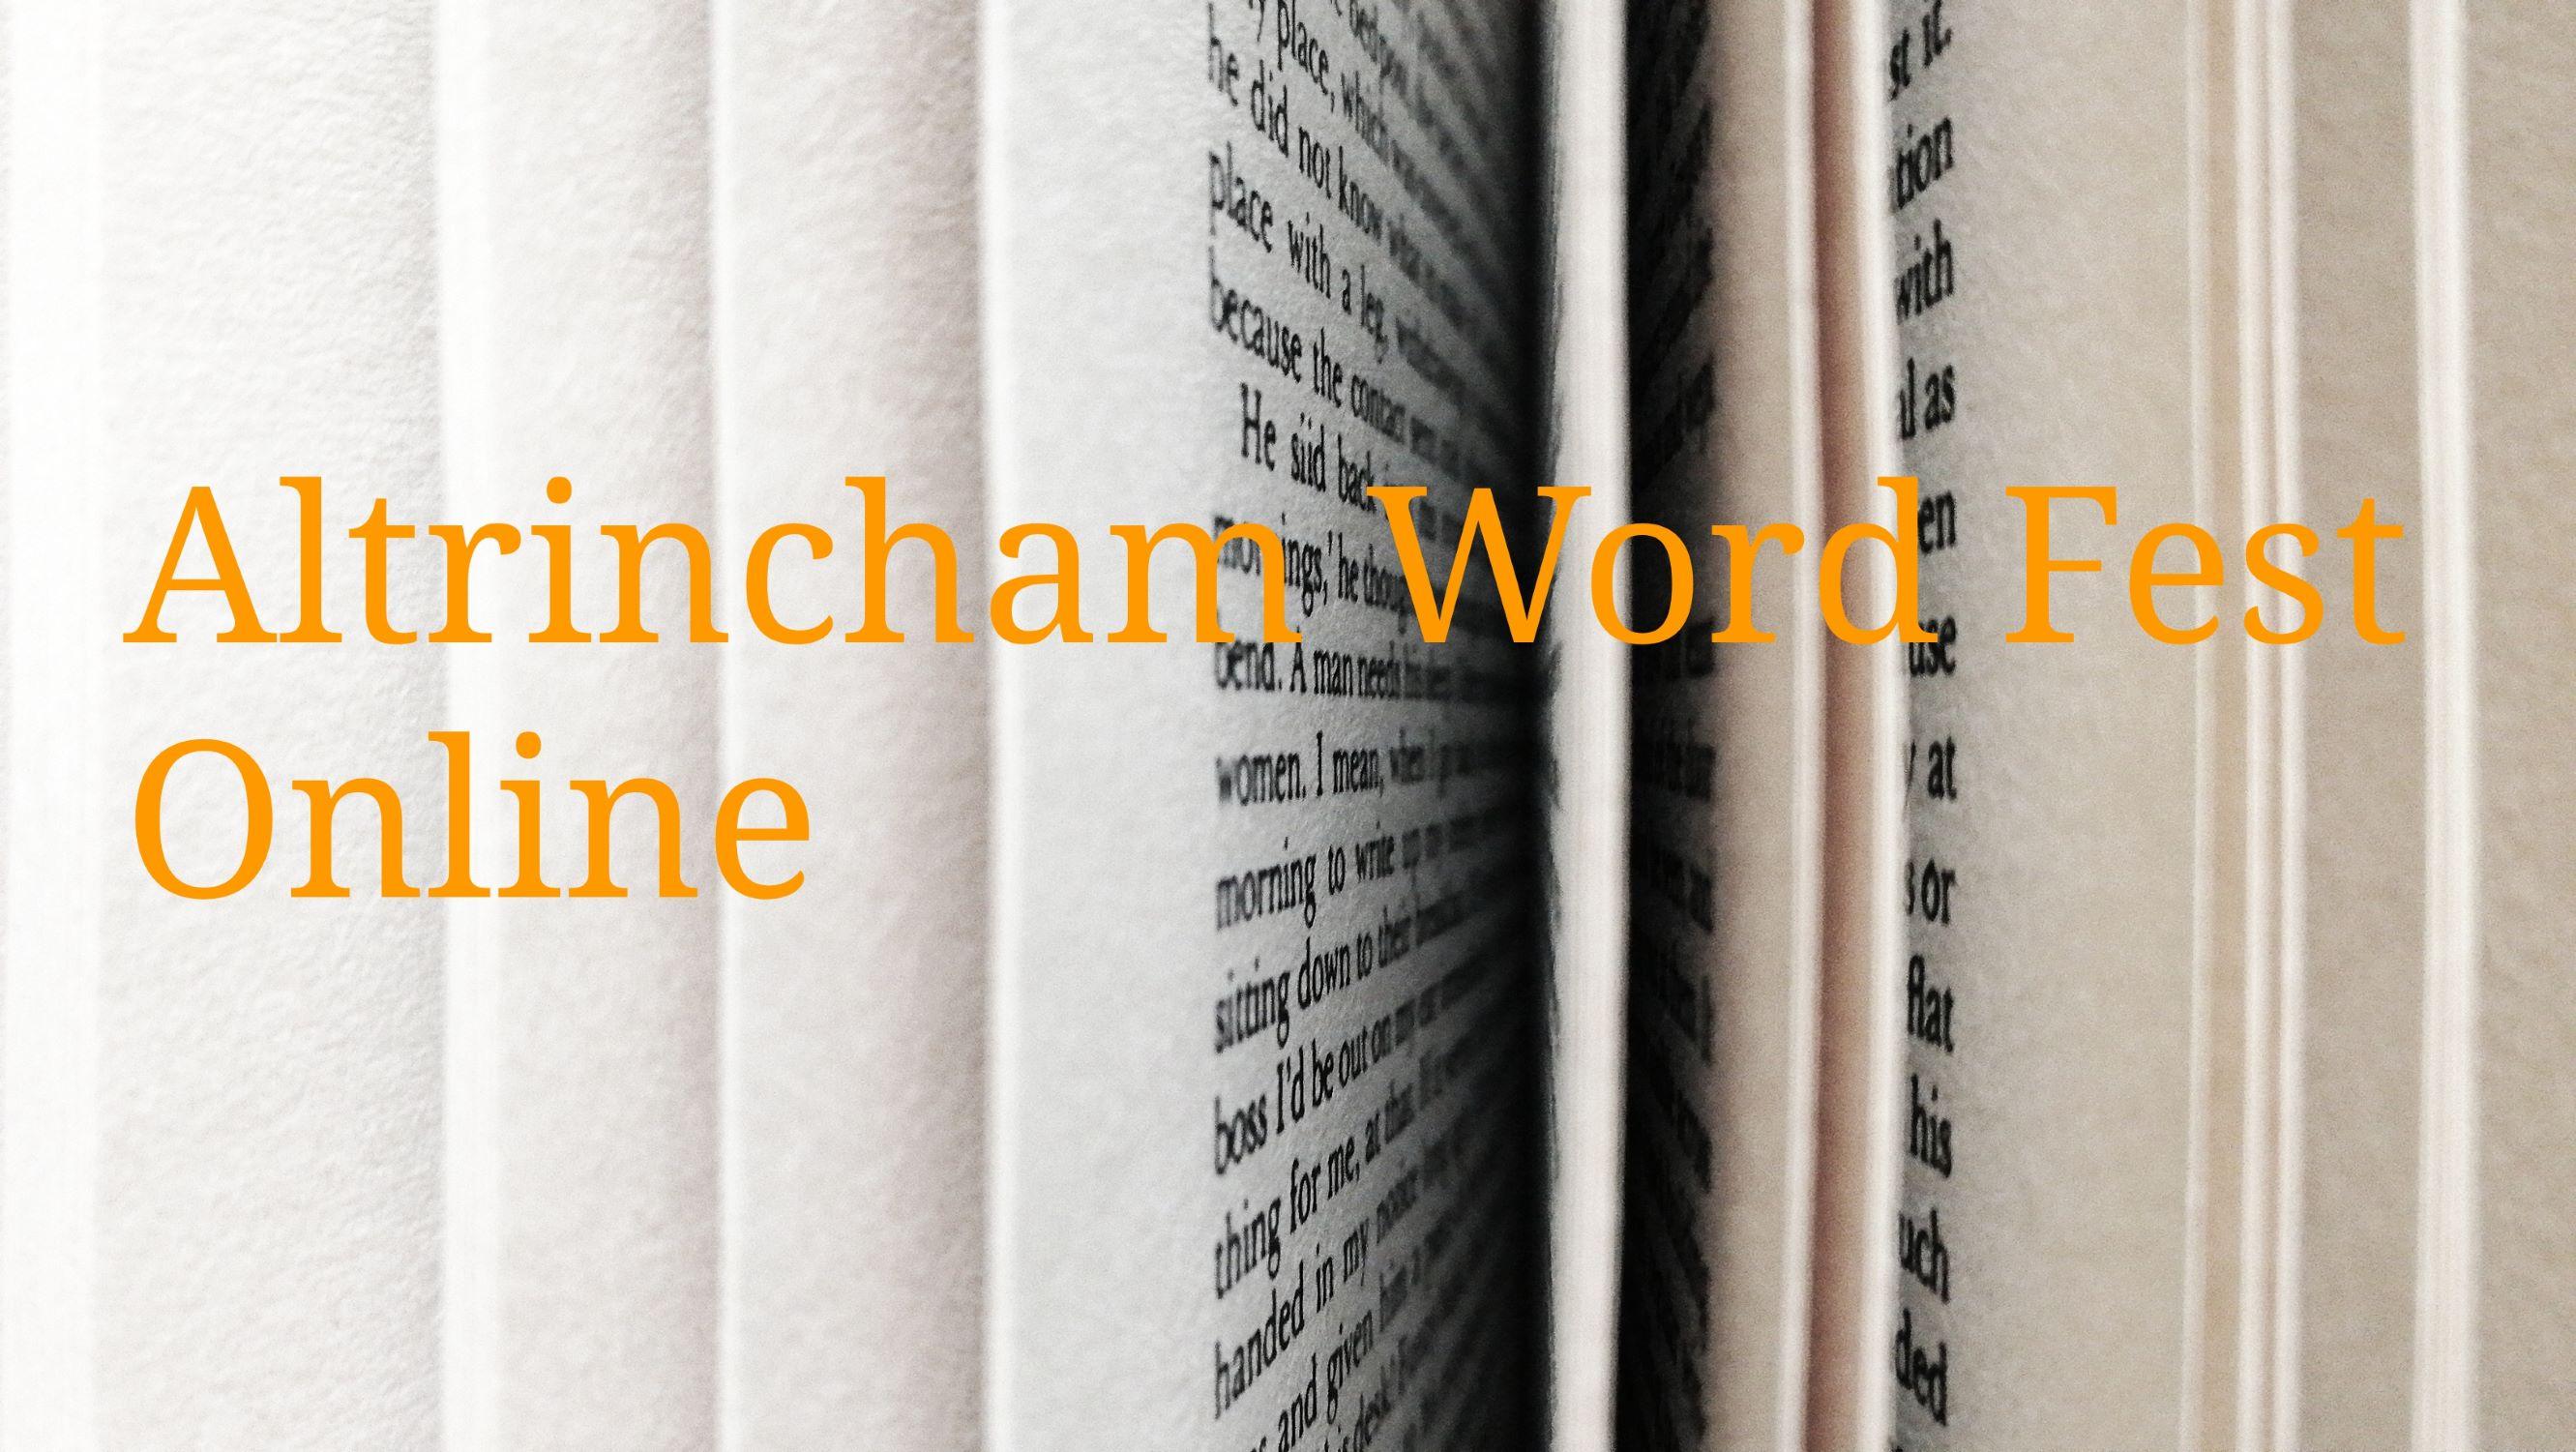 Word fest online